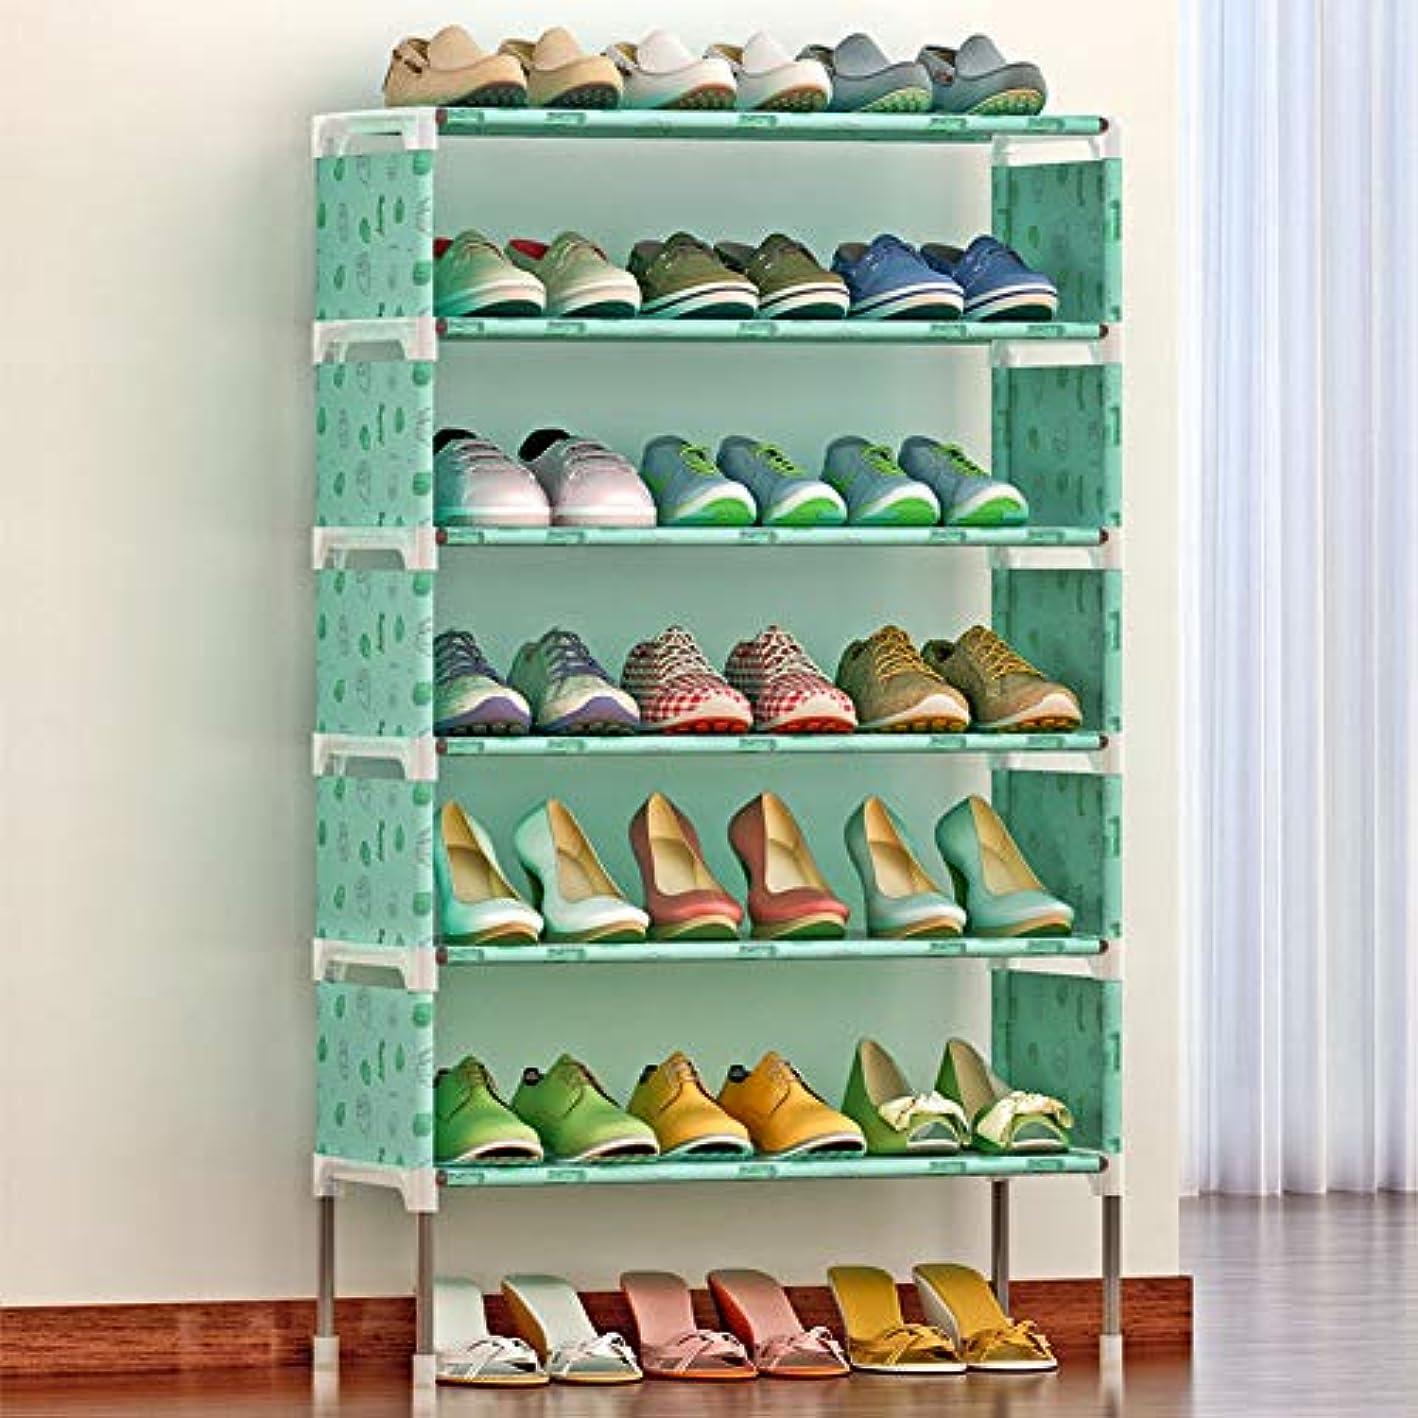 XUEXUE Shoe Rack, Storage Bench – Multi-Layer Assembly Dustproof Shoe Cabinet Closet, Bathroom, Kitchen, Entry Organizer Modern Wrought Iron Storage Rack Wholesale,C